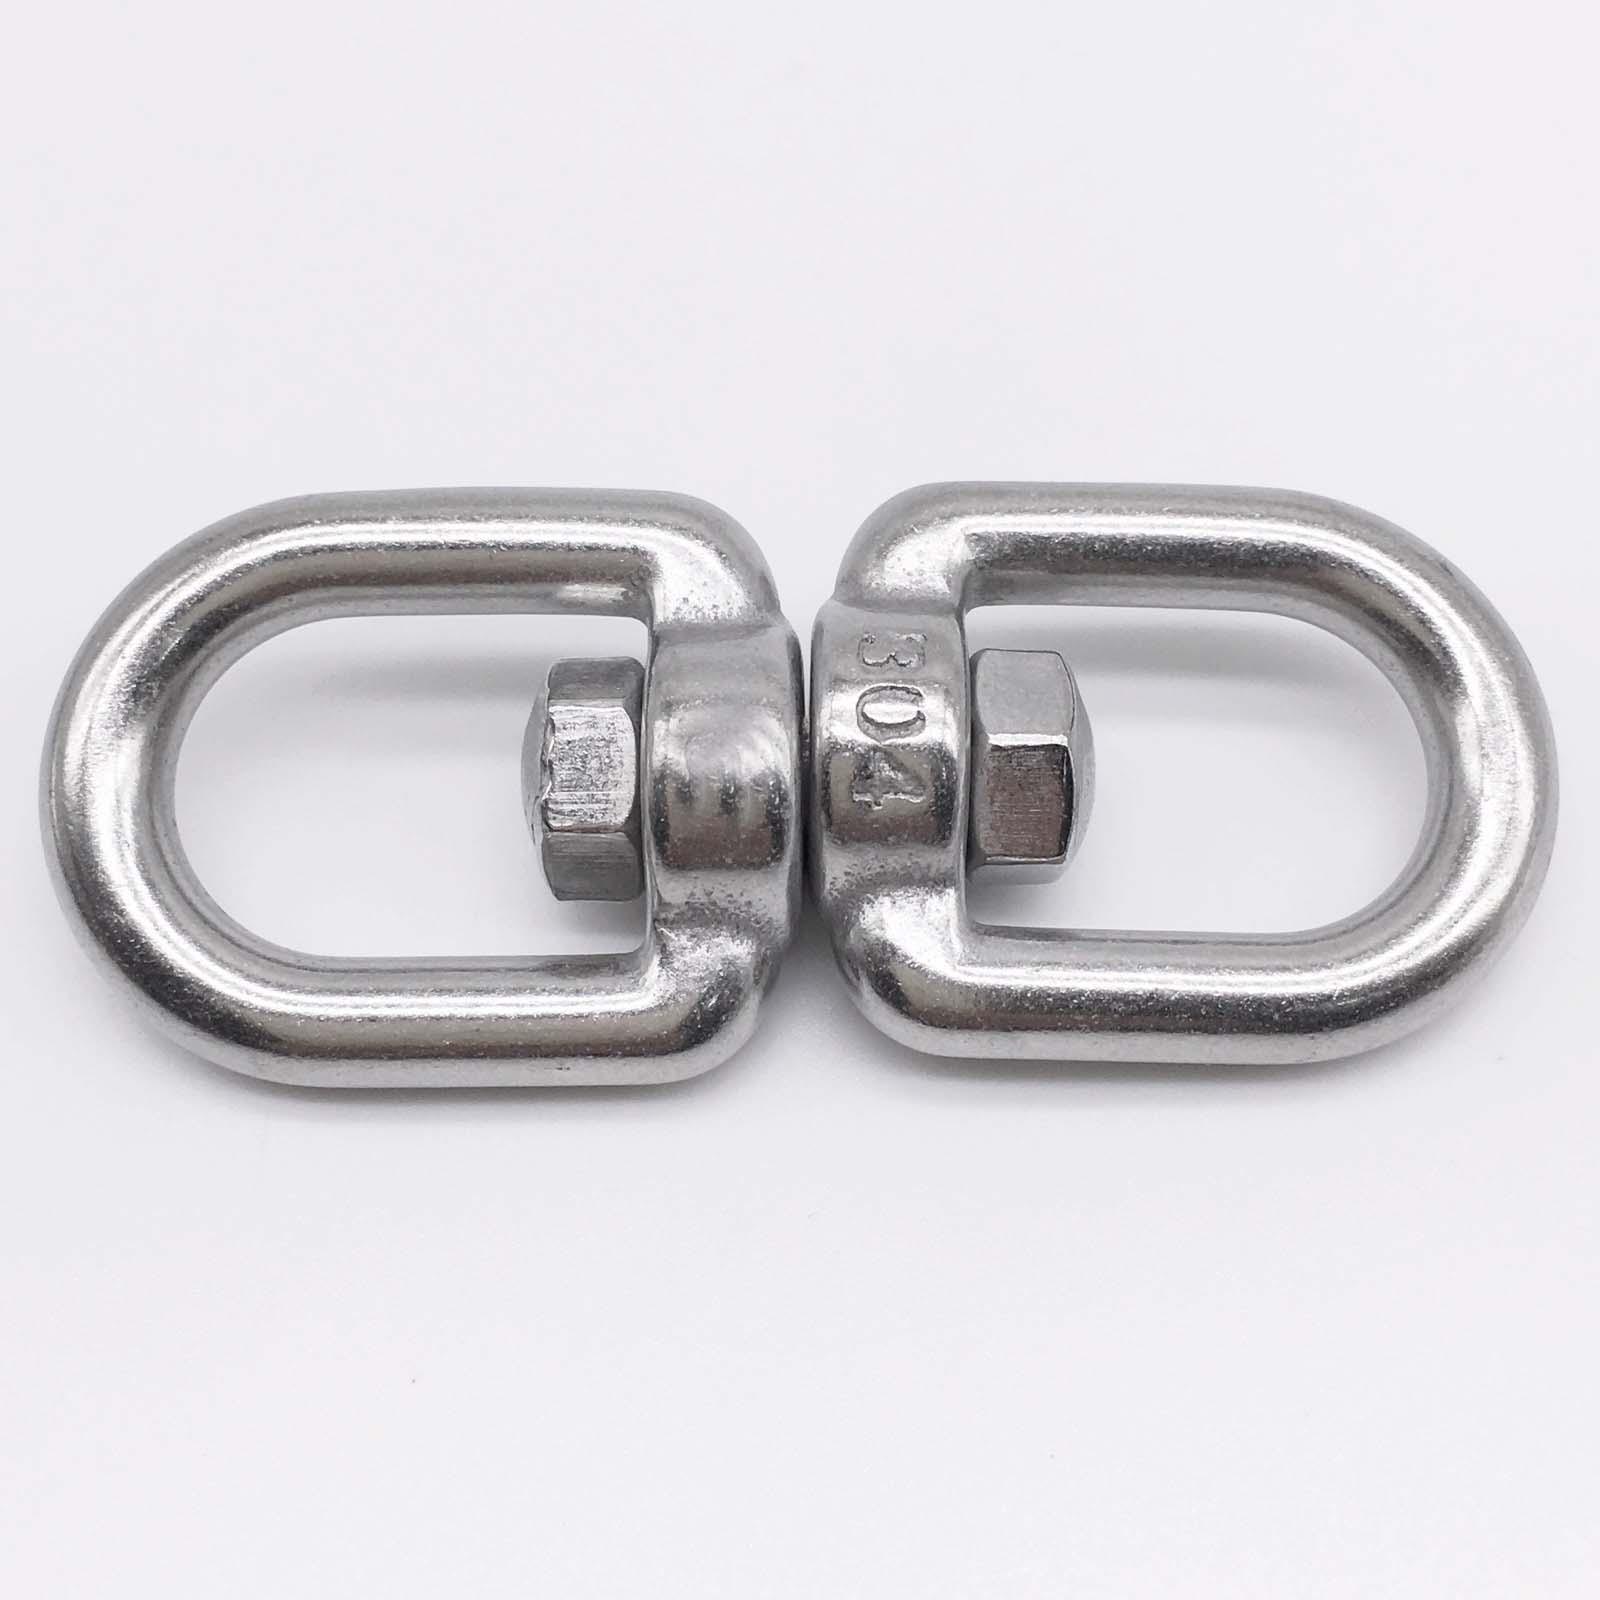 M8 Eye to Eye Swivel 304 Stainless Steel Silver Tone